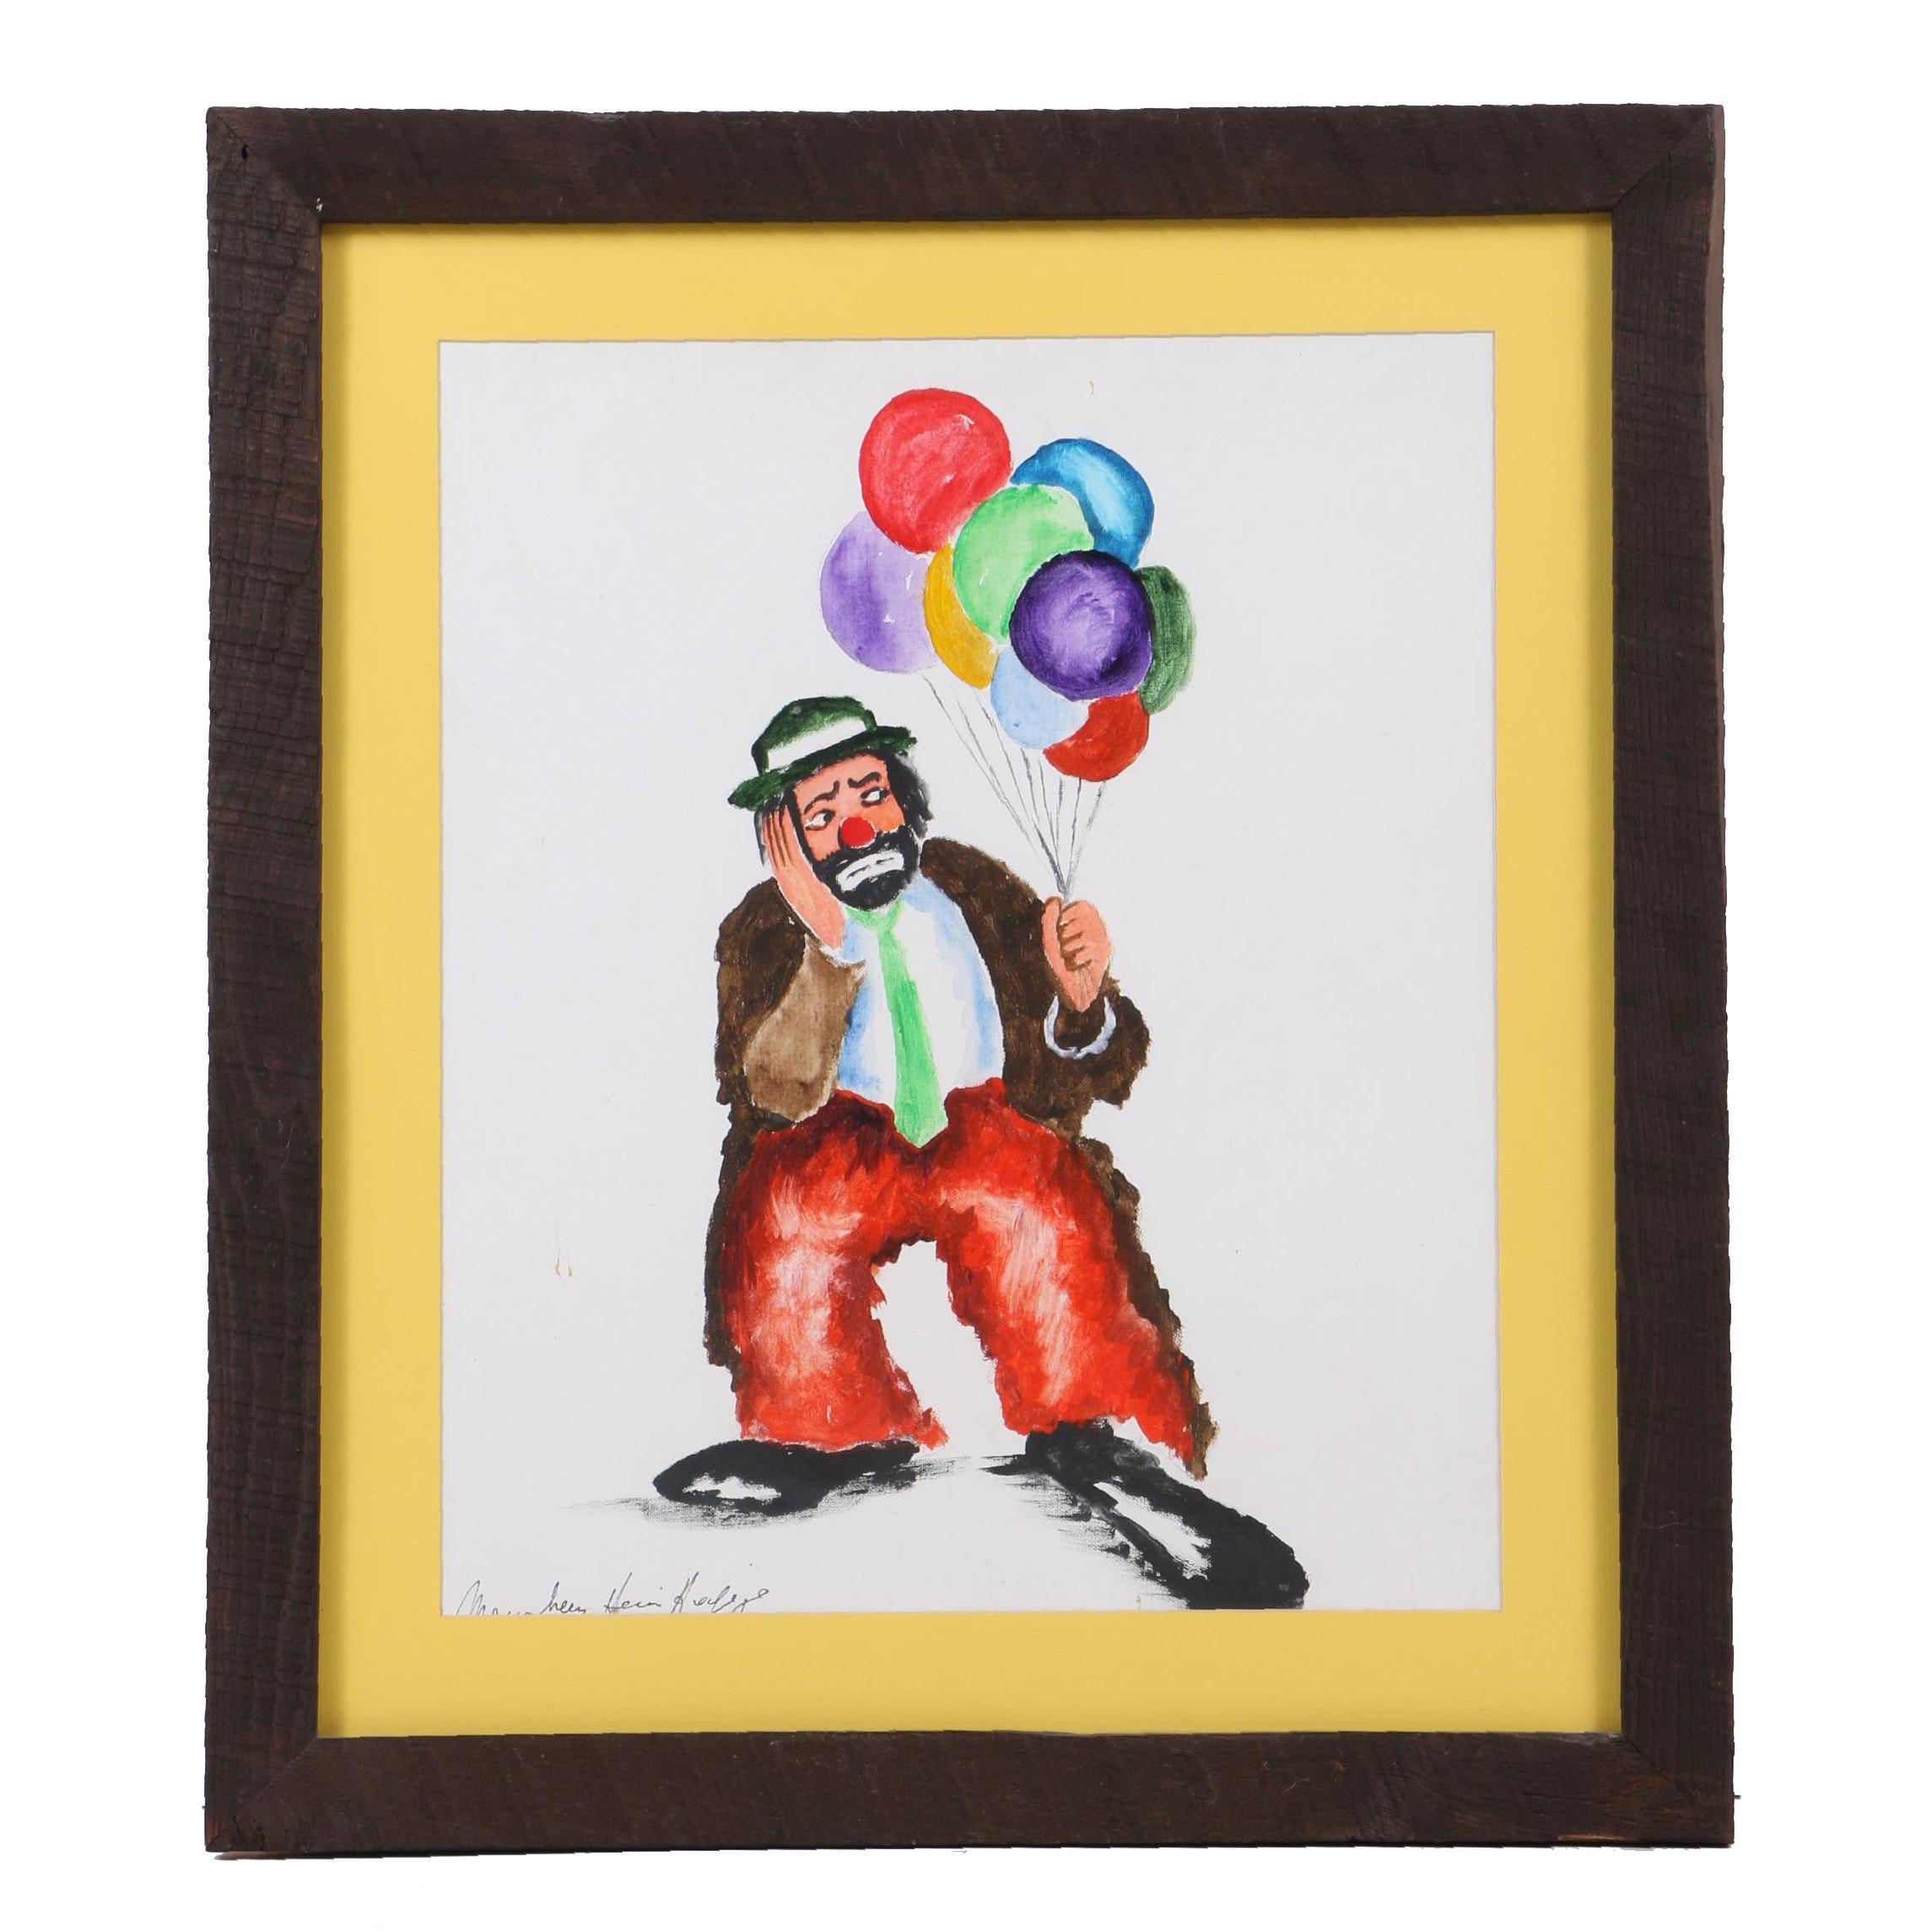 Acrylic Painting on Canvas Board of Sad Clown